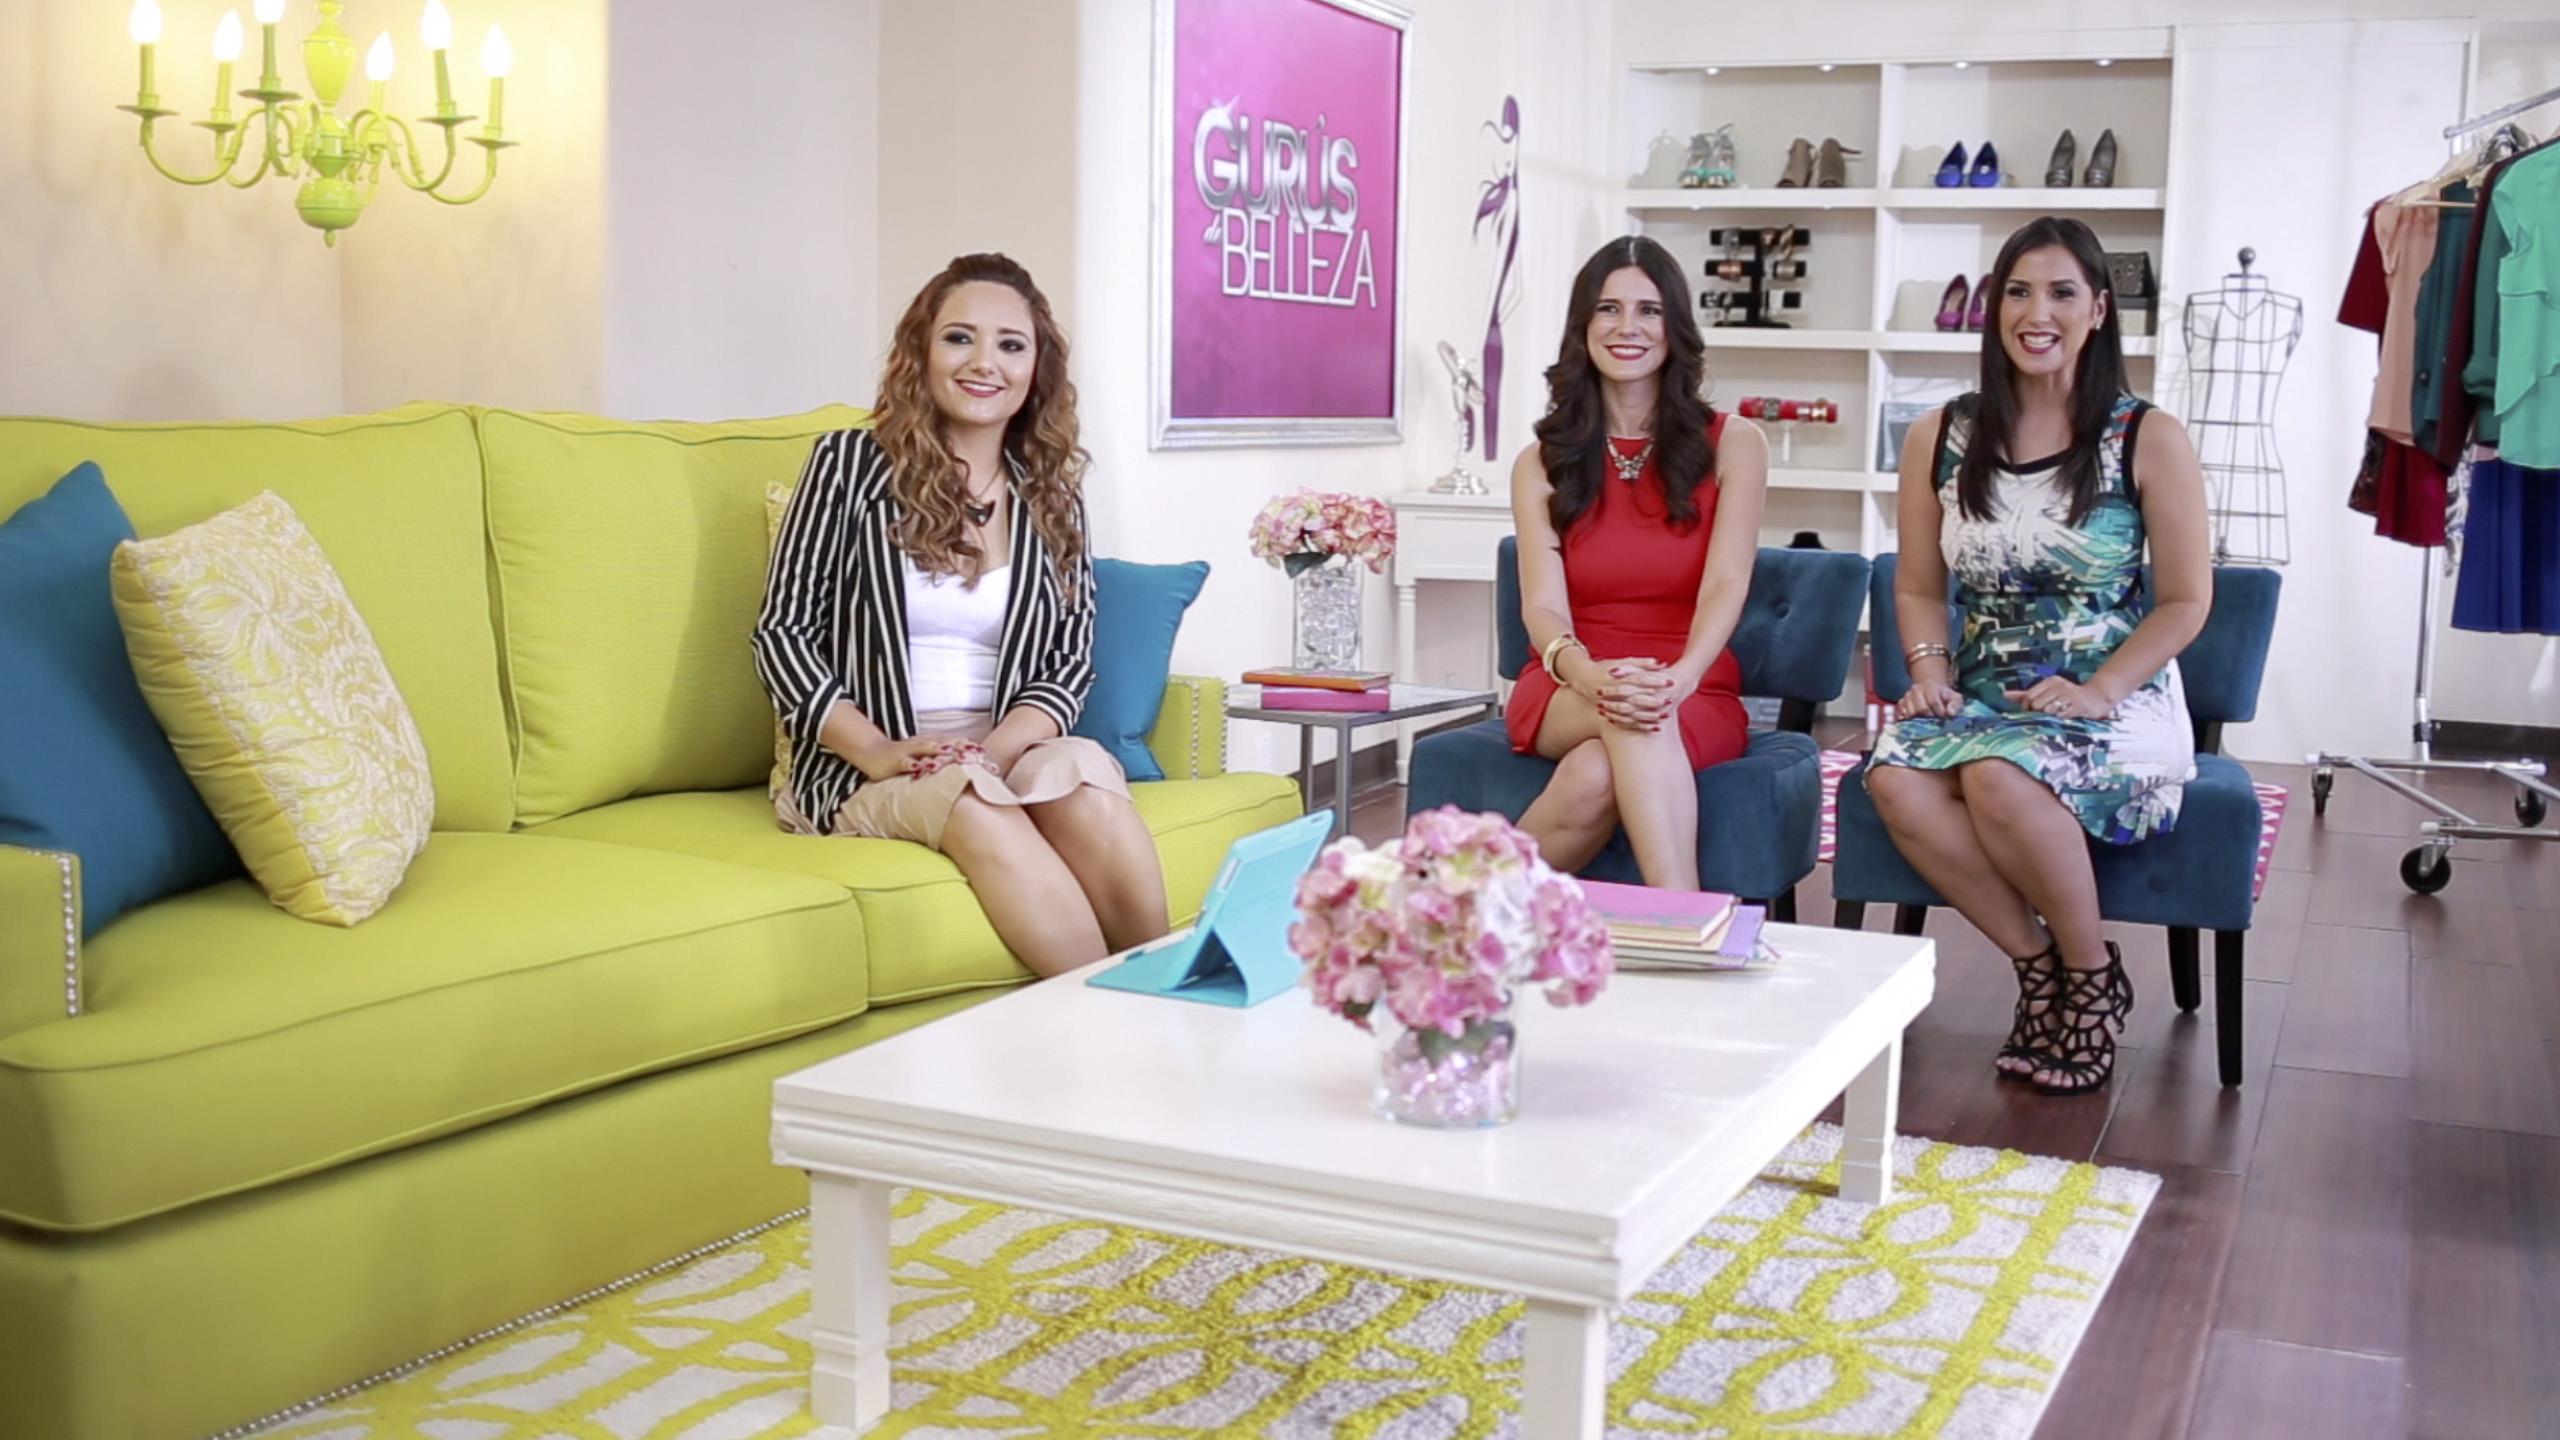 A Trio Of Latina Experts Hosts The New Discovery Familia Original Production Gurus De Belleza